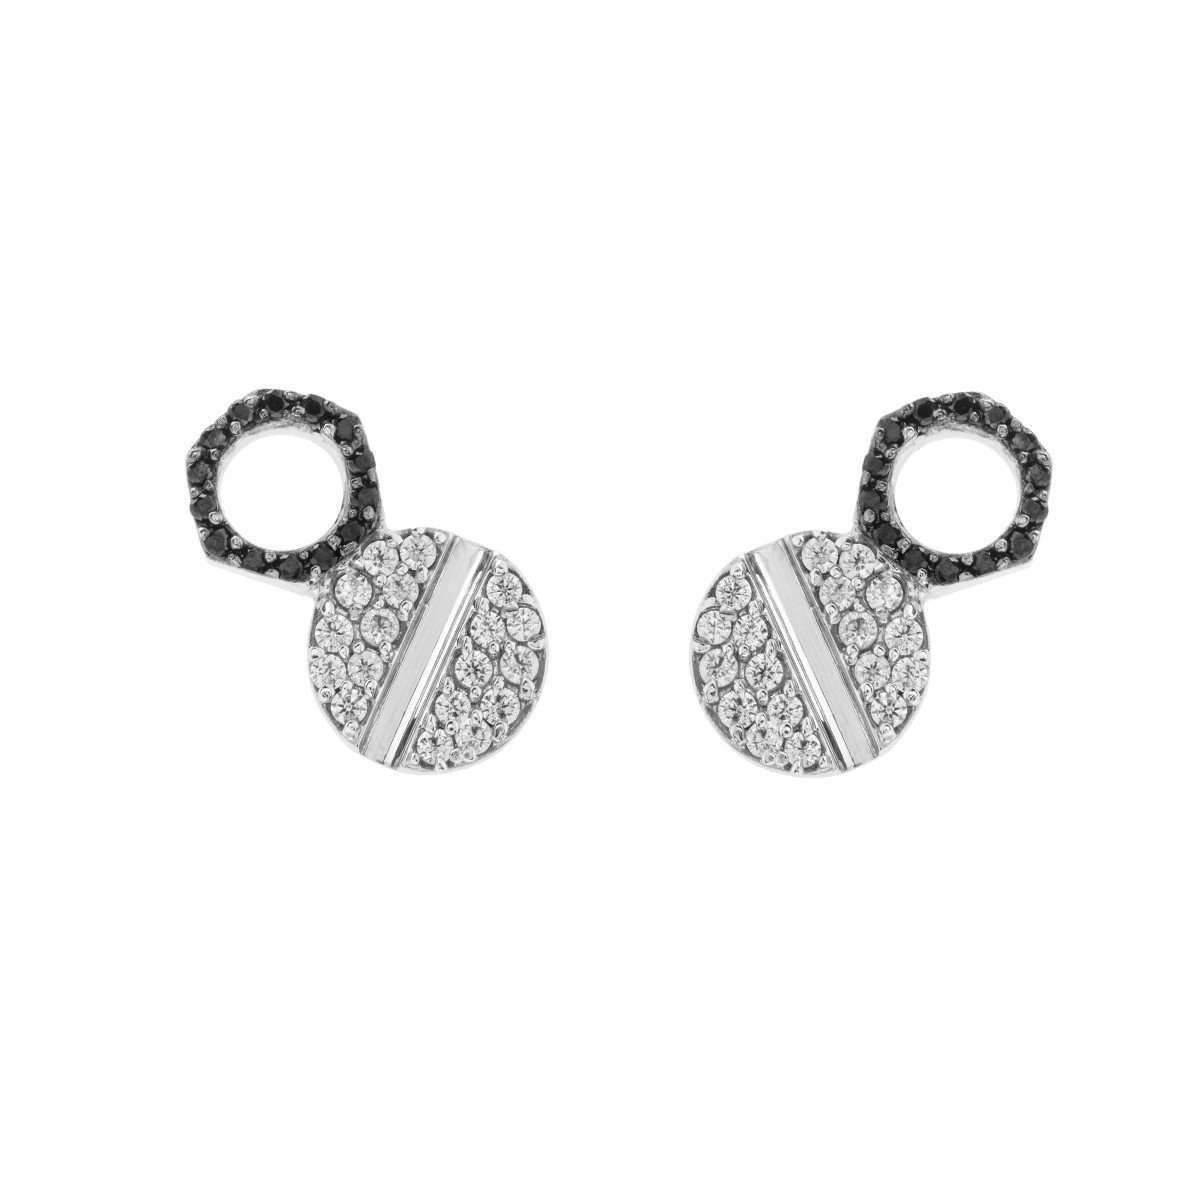 Joanna Laura Constantine Link Stud Earrings a7ob4